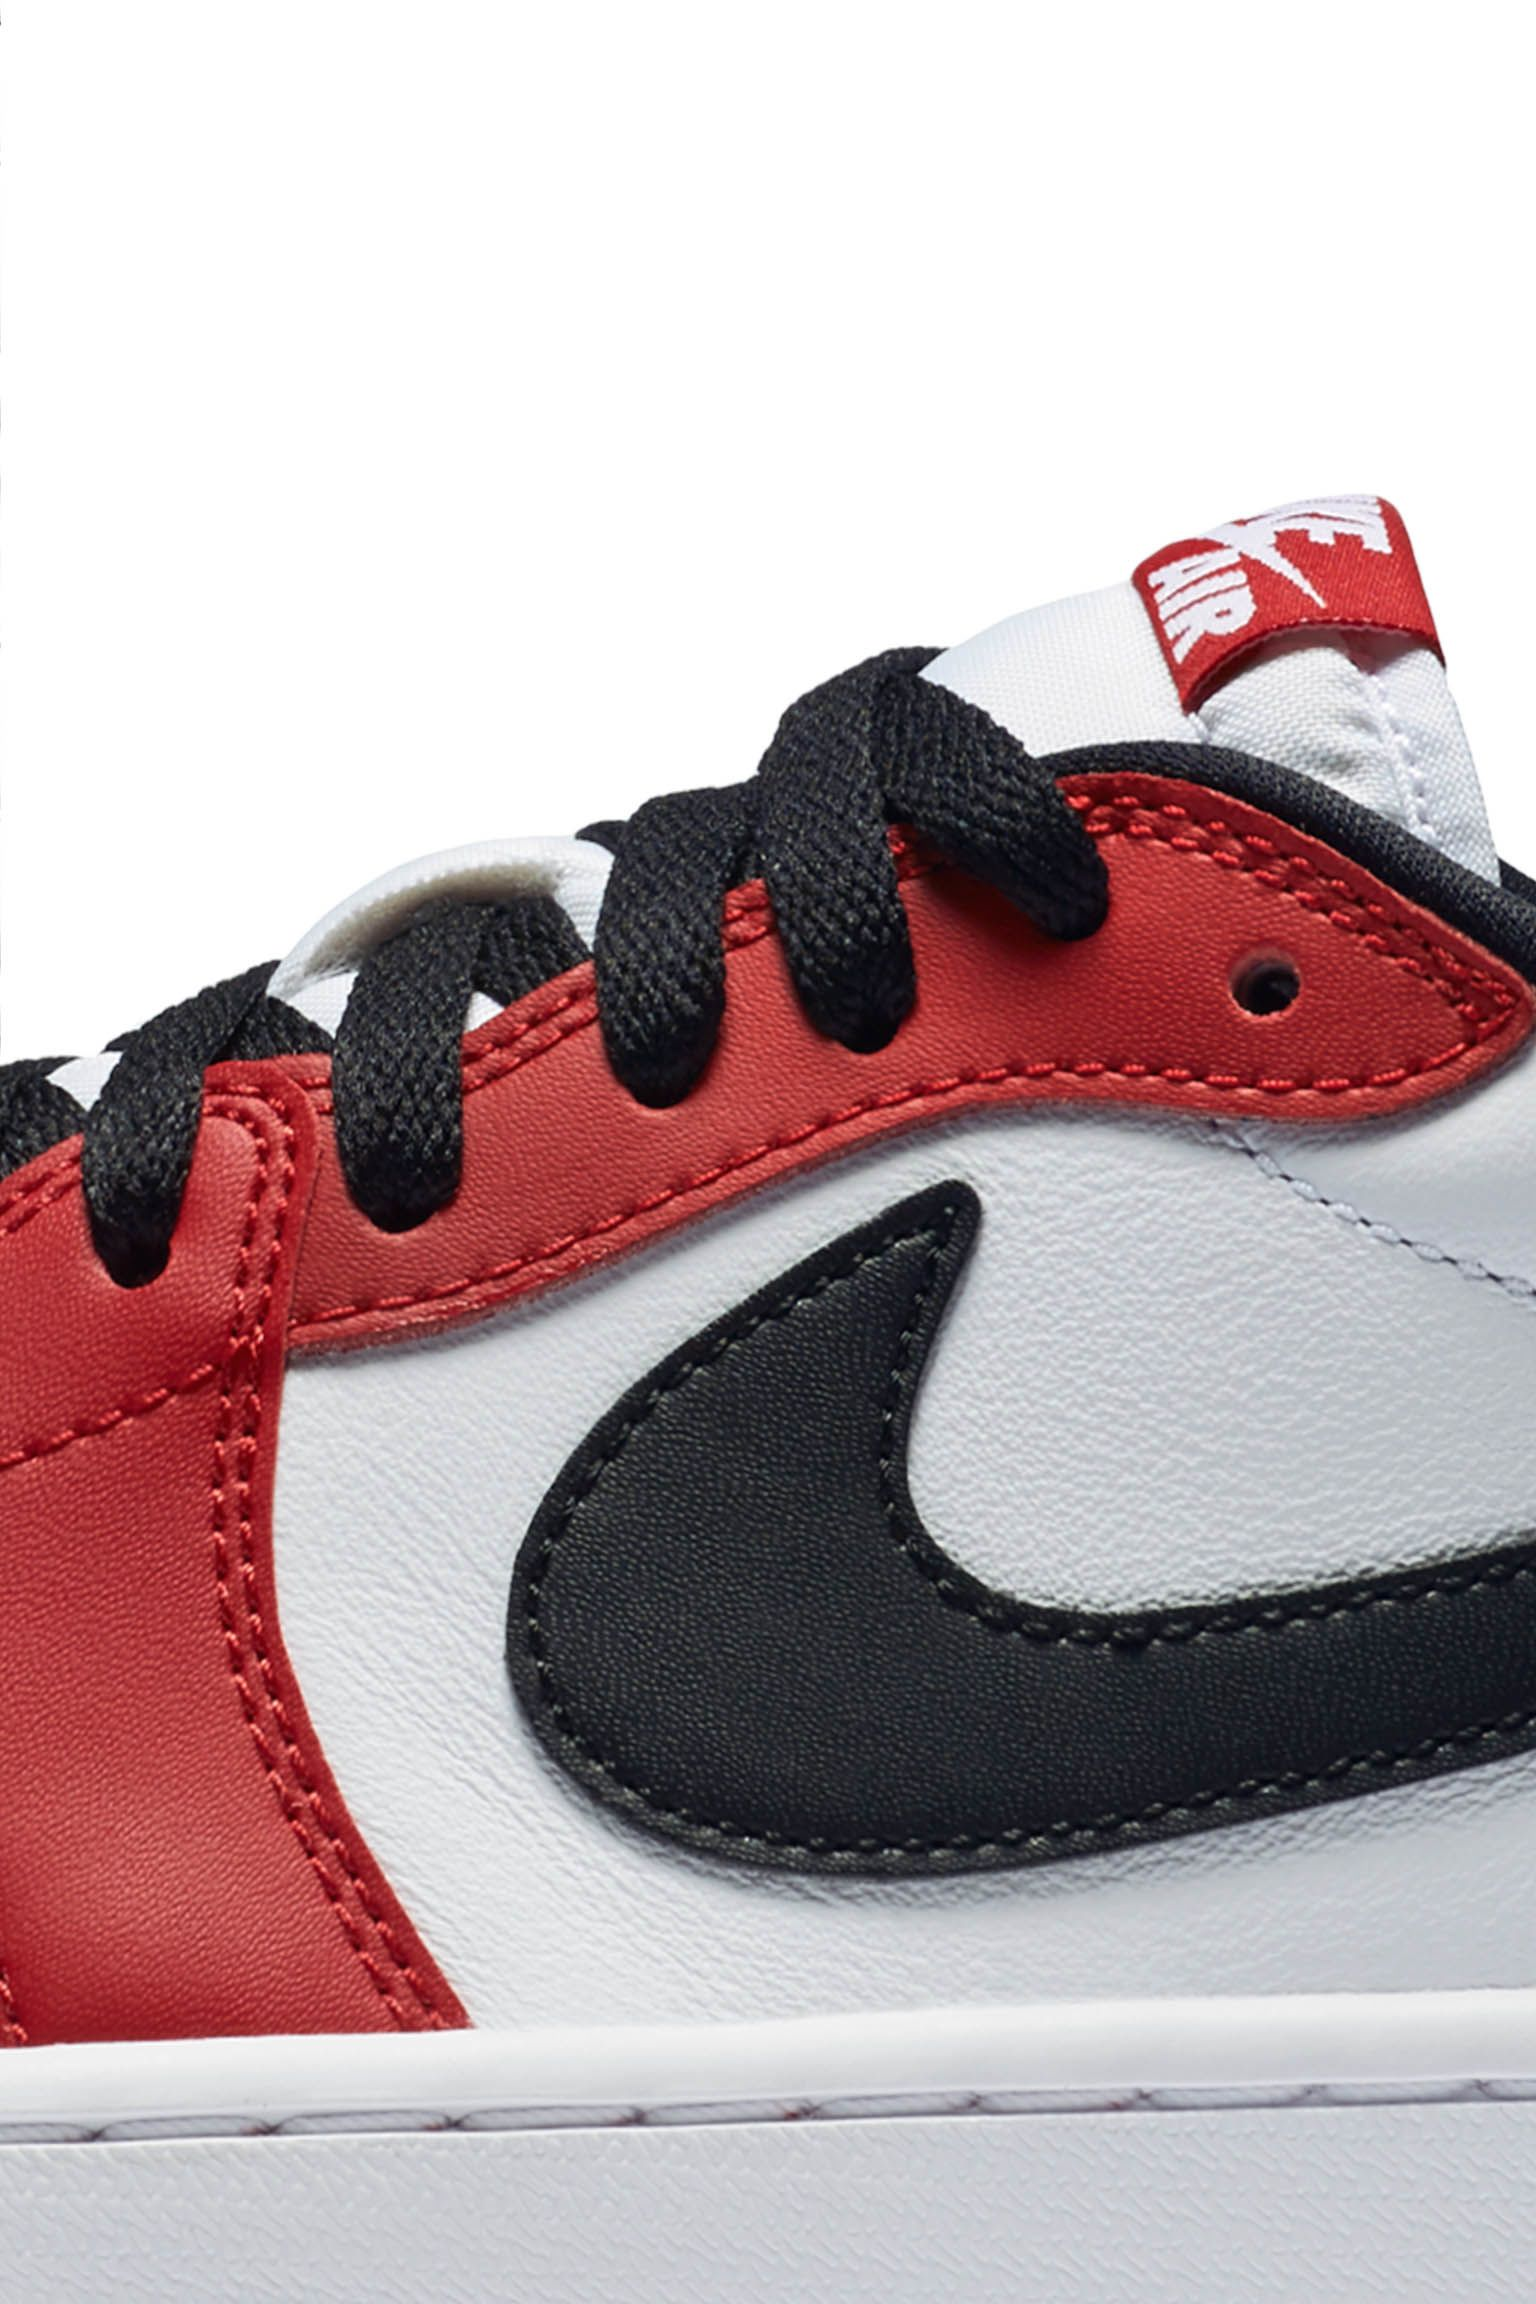 Air Jordan 1 Retro Low 'Chicago' Release Date